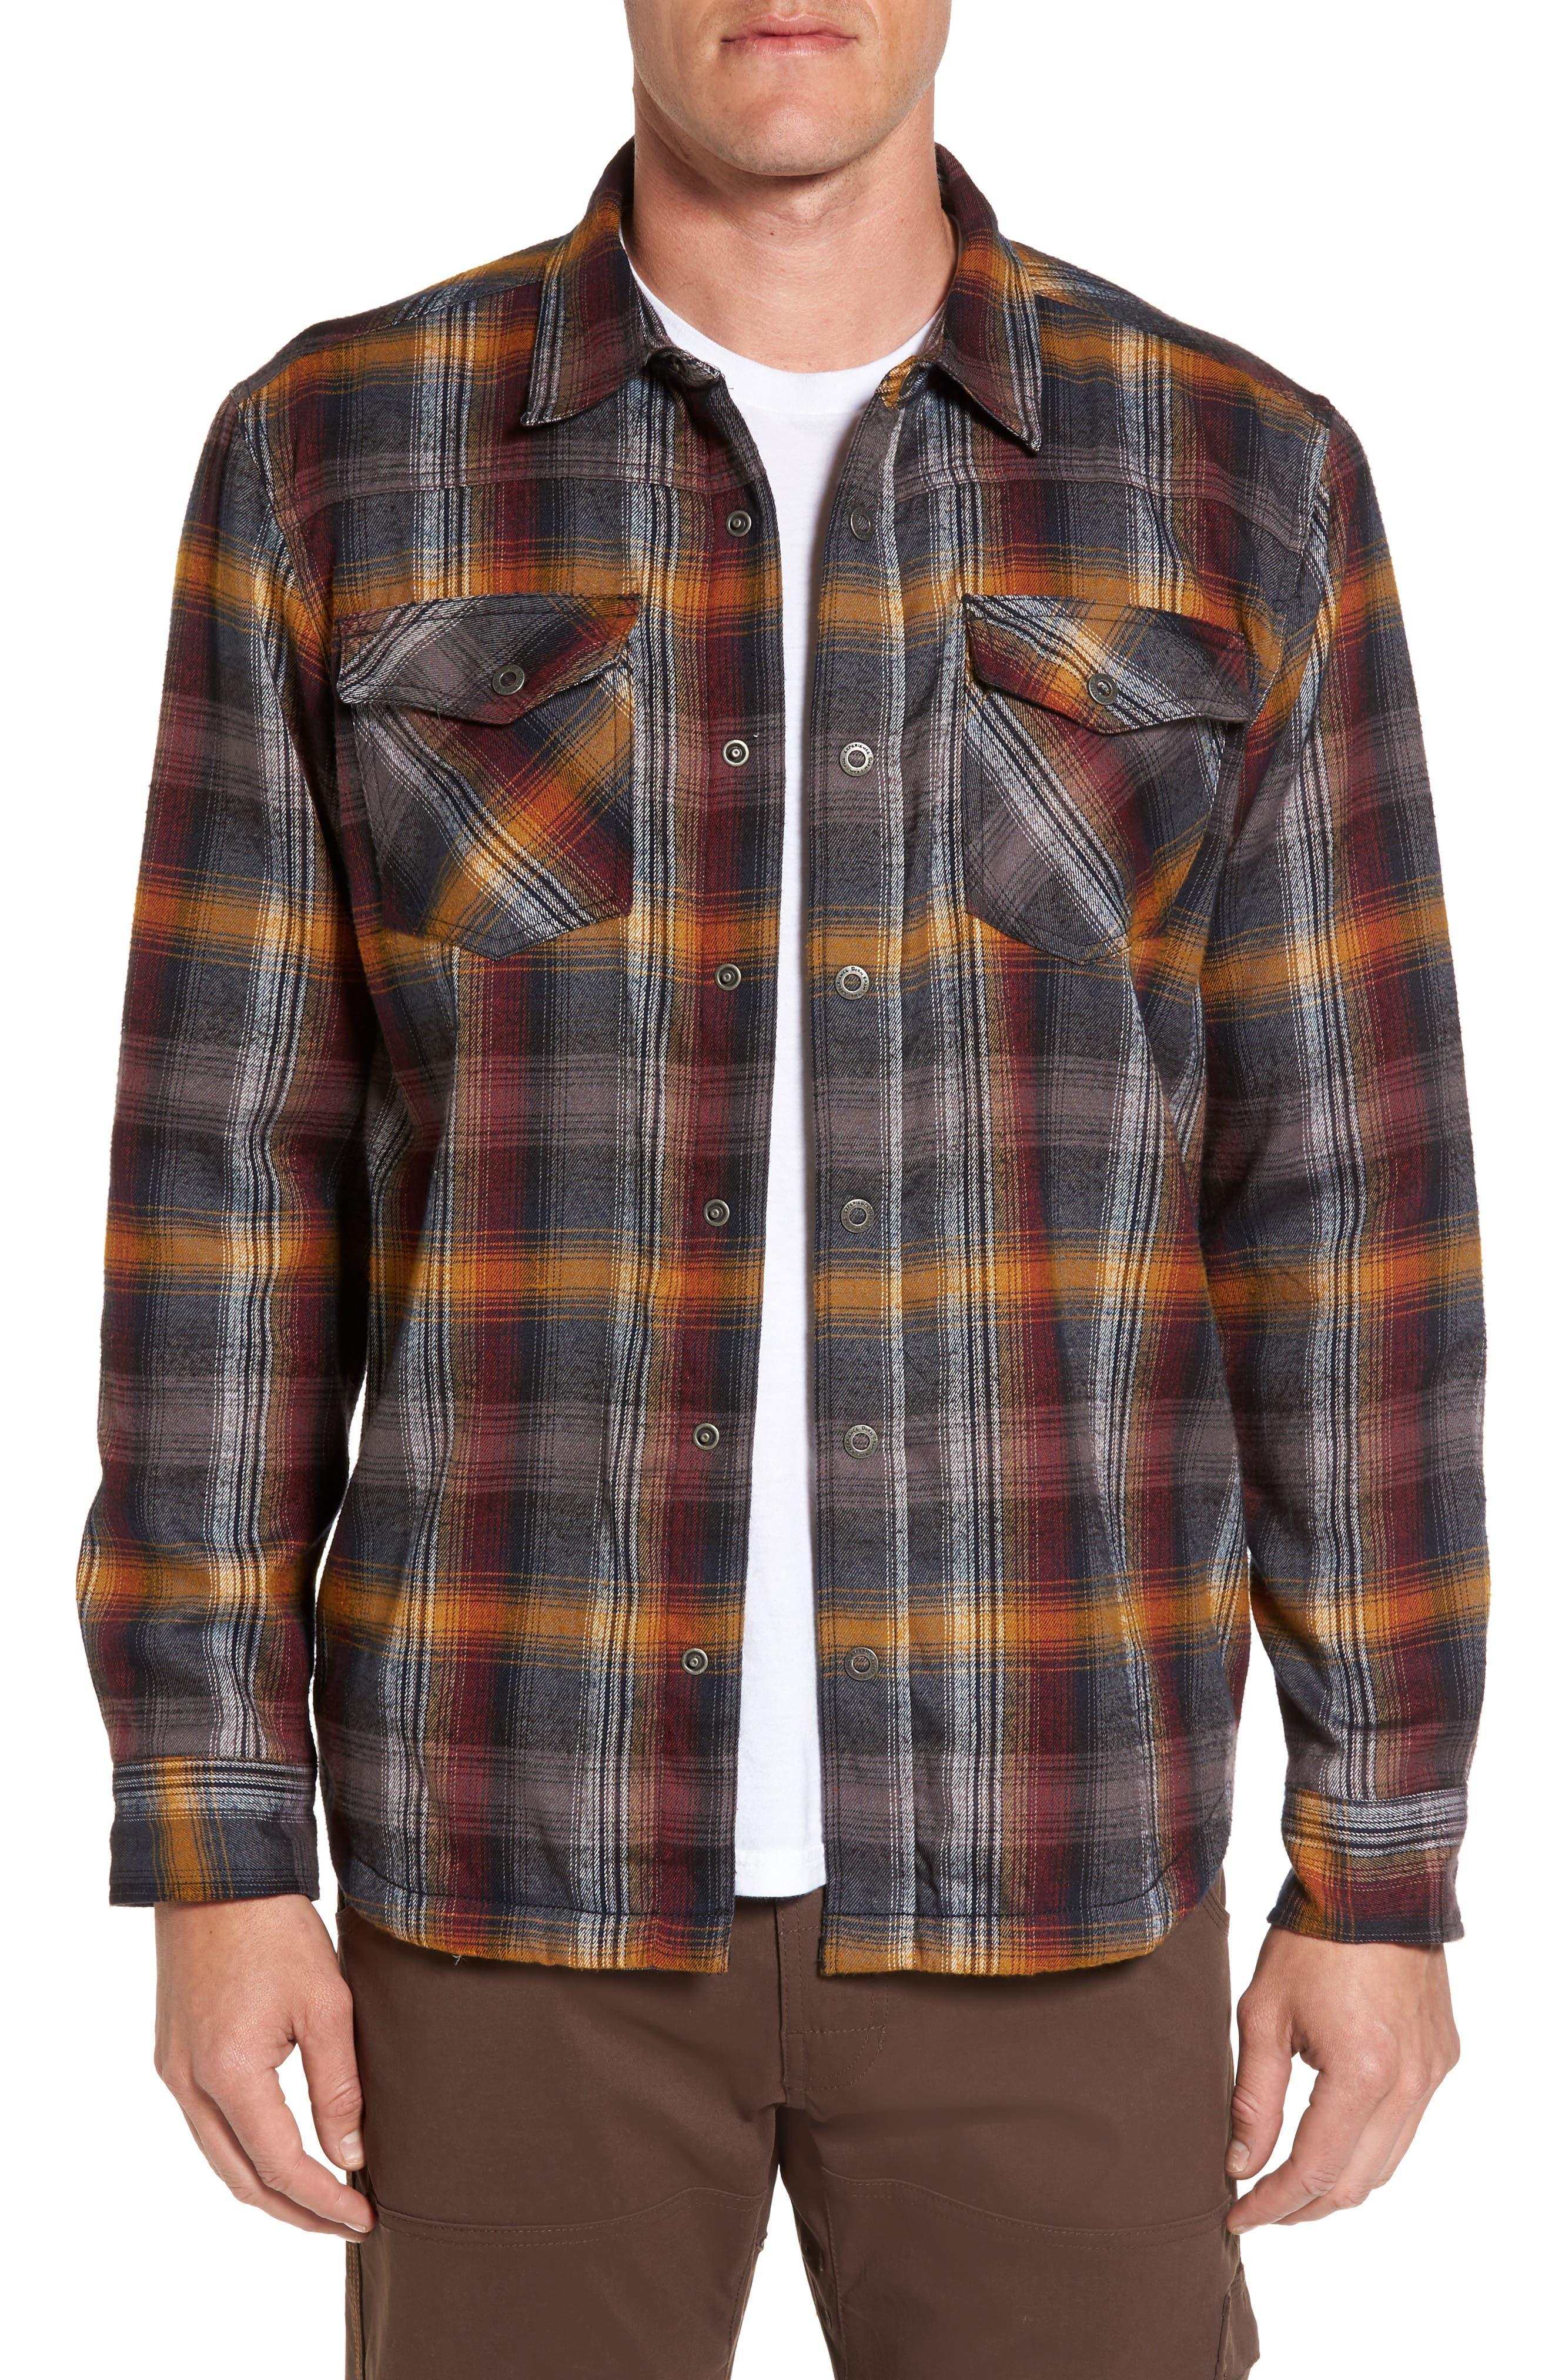 Asylum Regular Fit Plaid Shirt Jacket,                             Main thumbnail 1, color,                             Black